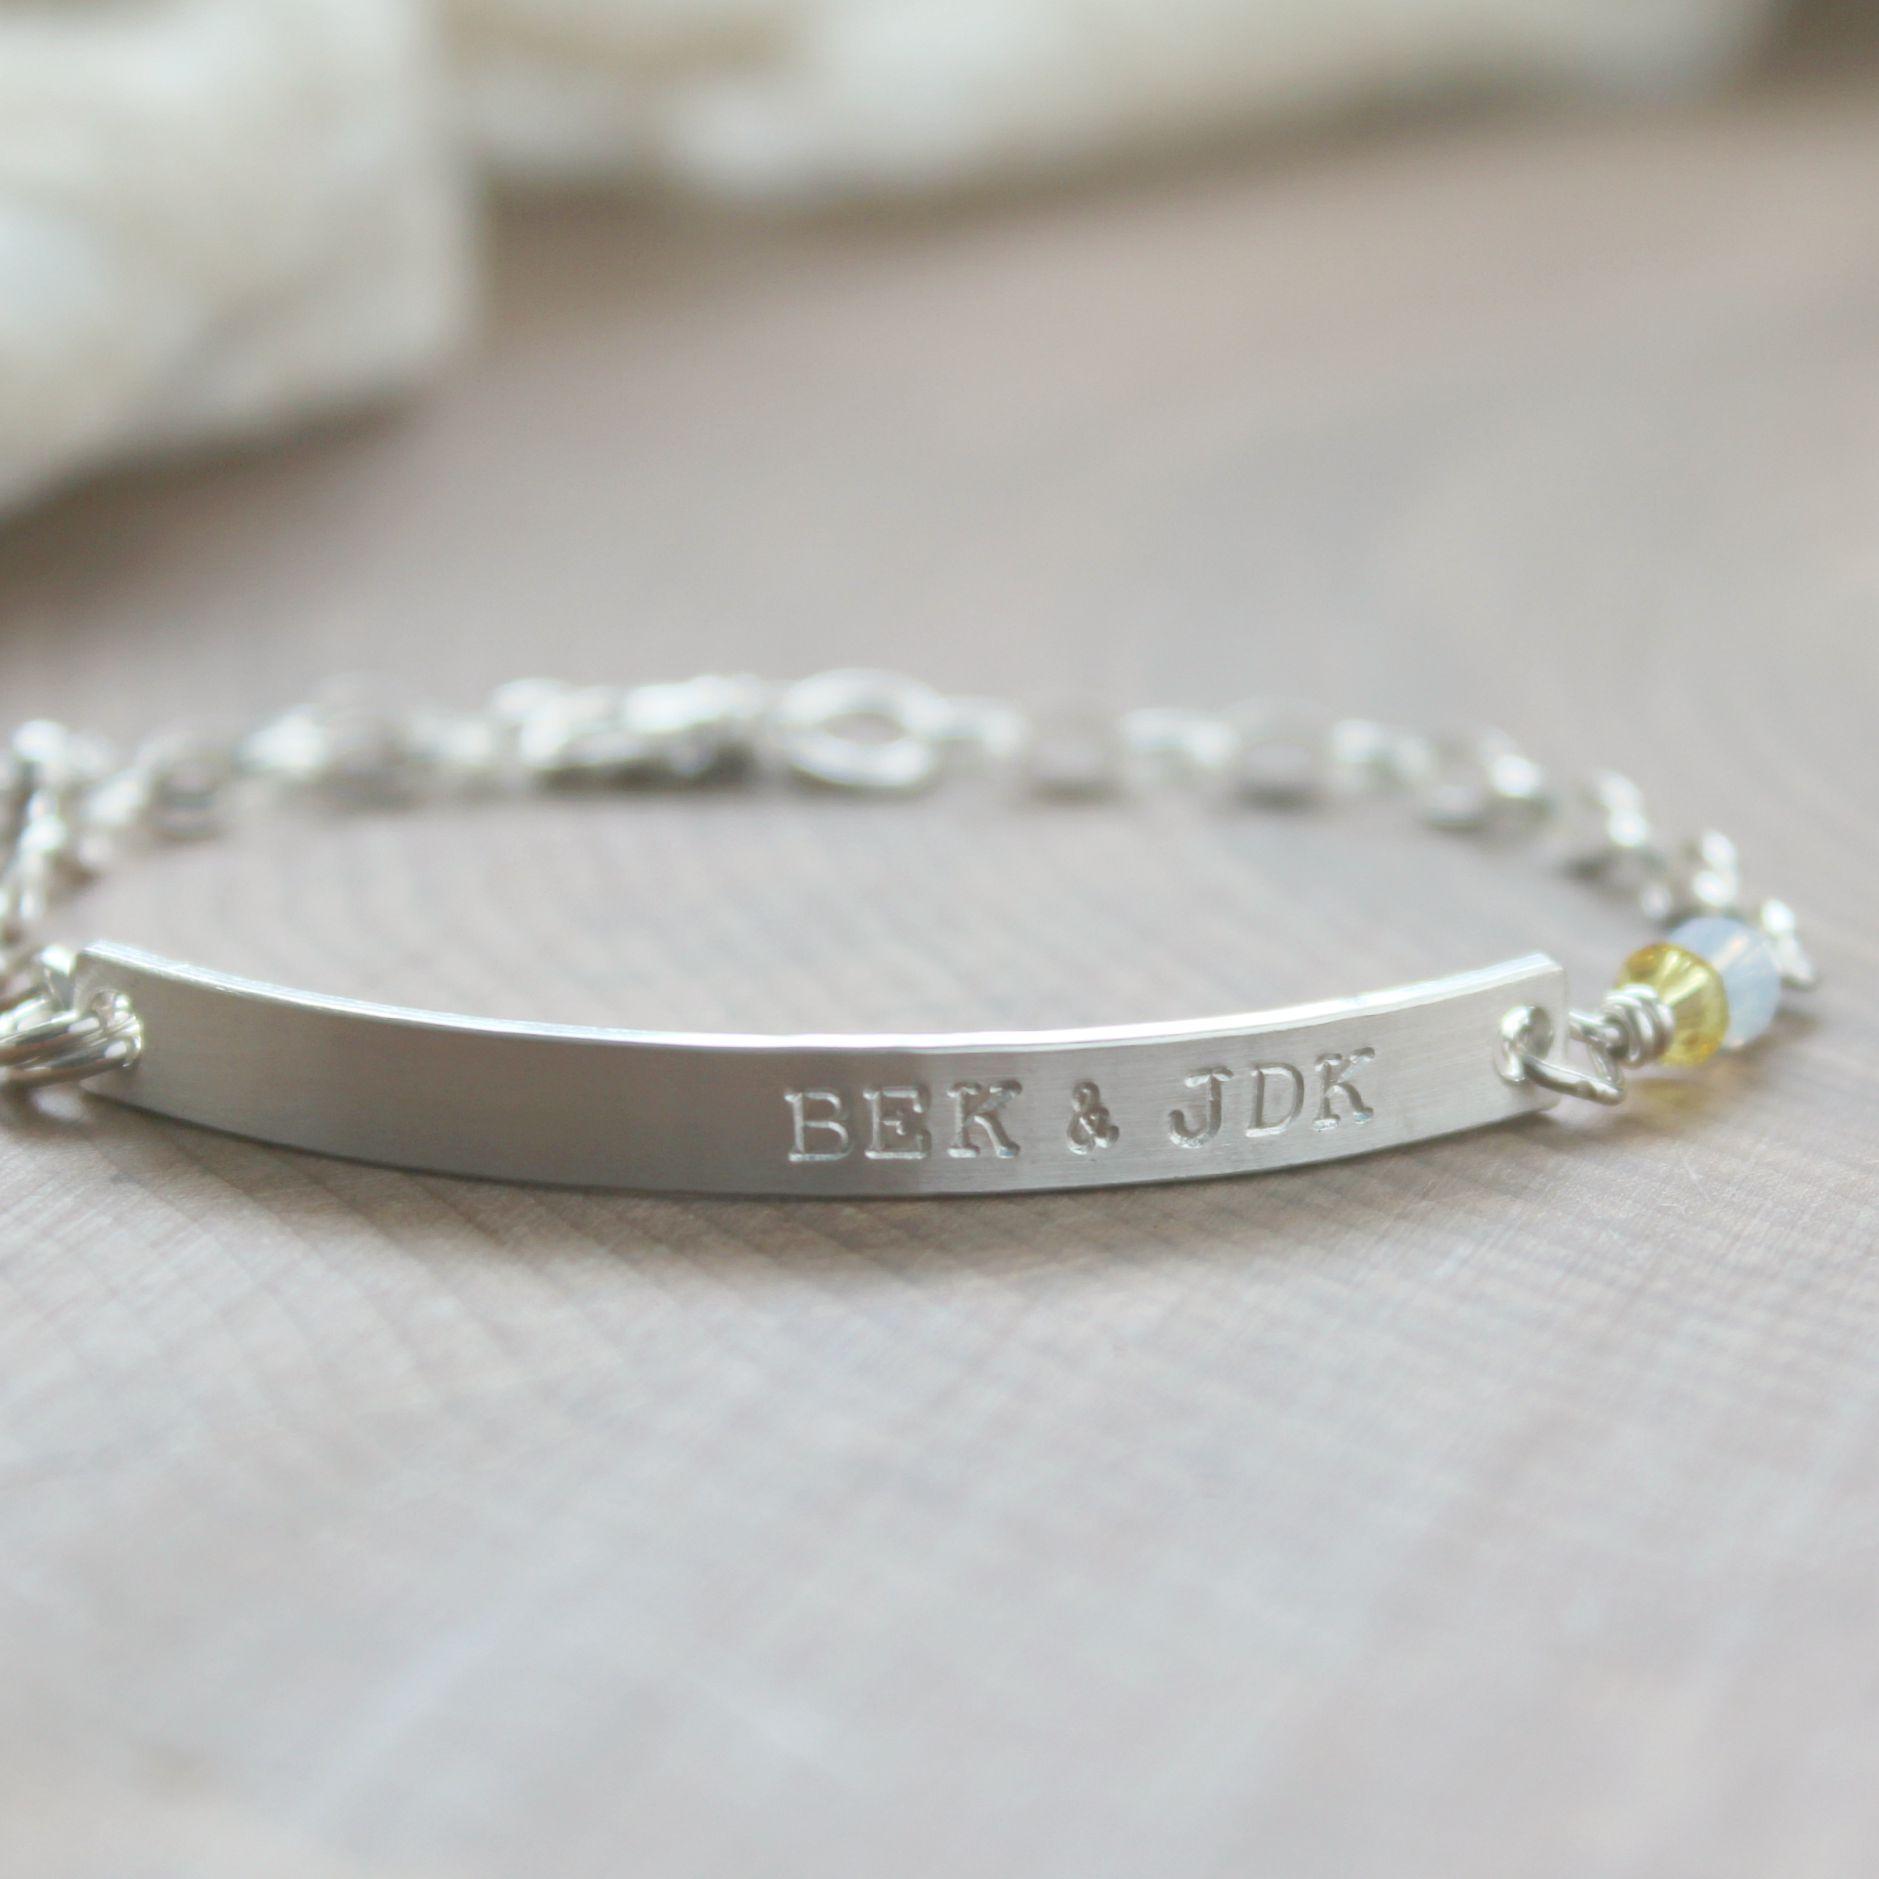 0a4d76c9783ffc Skinny Silver ID Bracelet, Custom Personalized Bar Bracelet, Initial Or Name  Bracelet, Sterling Silver Thick And Skinny Bar, Coordinates Bracelet - Liza  ...